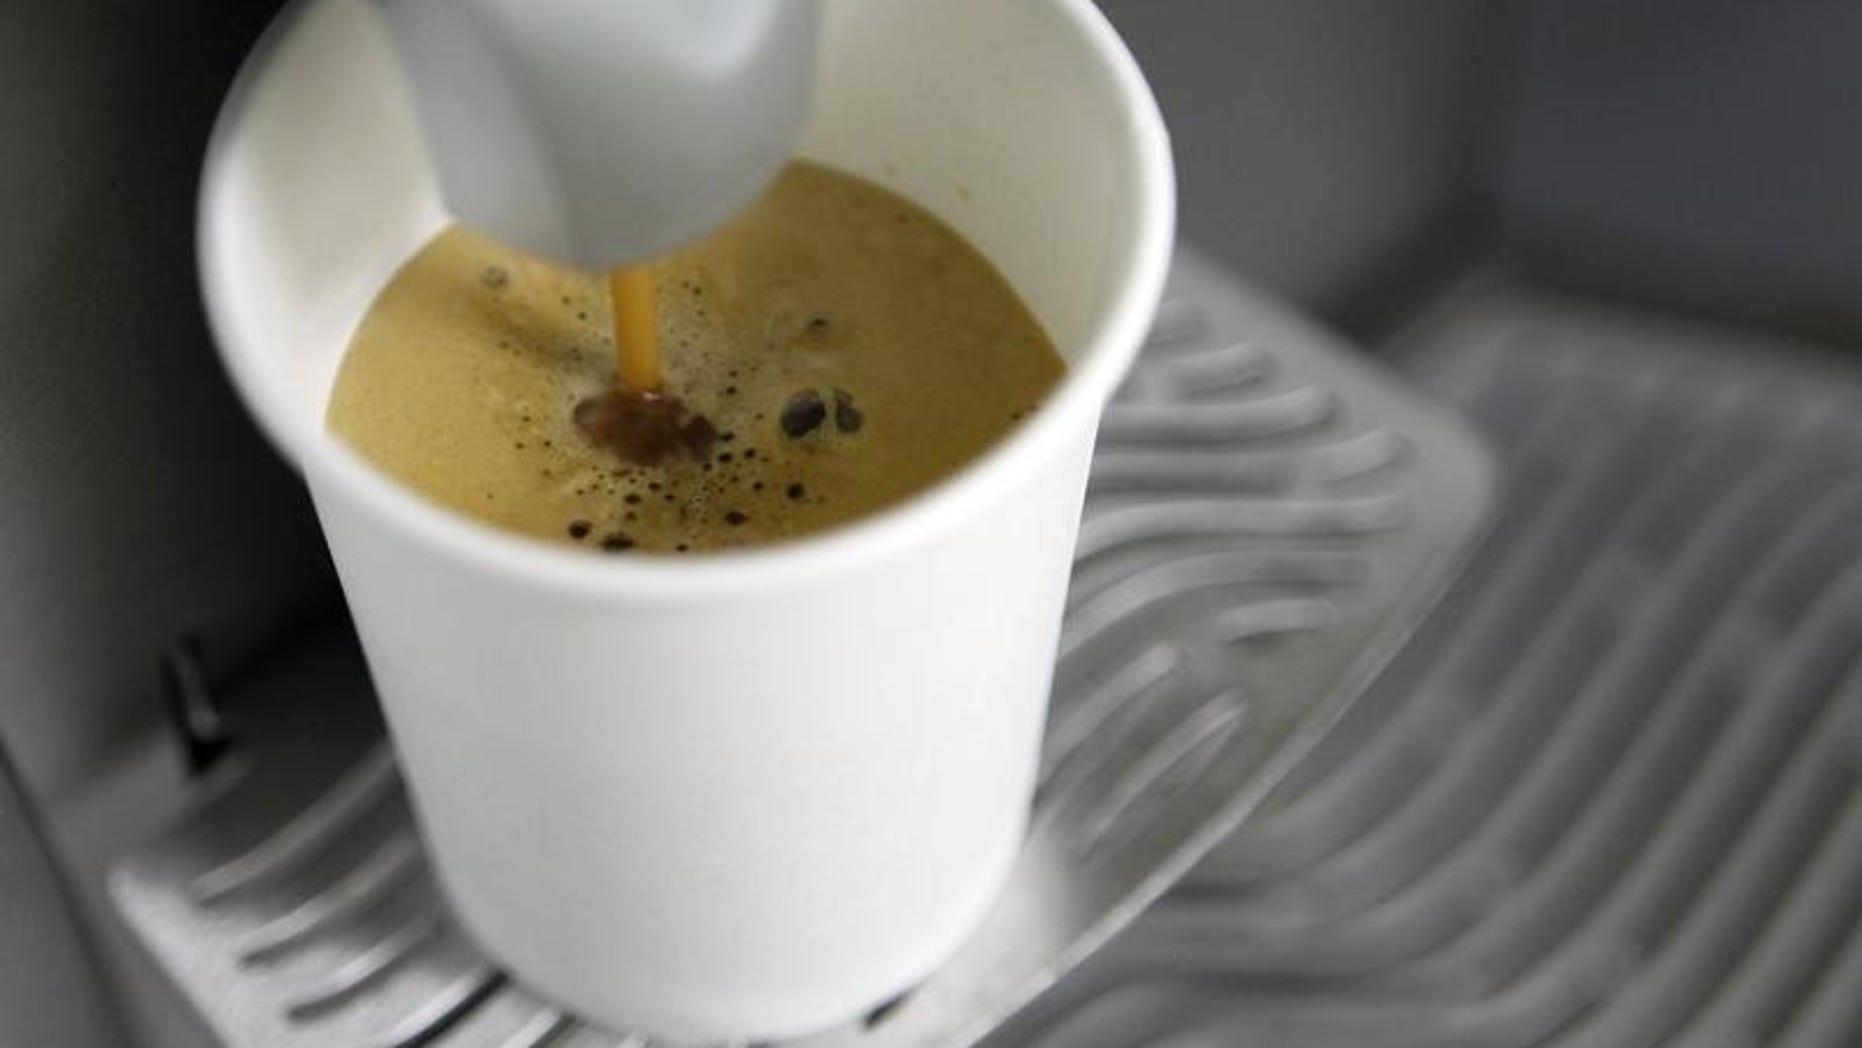 A coffee machine pours coffee into a paper cup in Kiev March 1, 2012.   REUTERS/Gleb Garanich